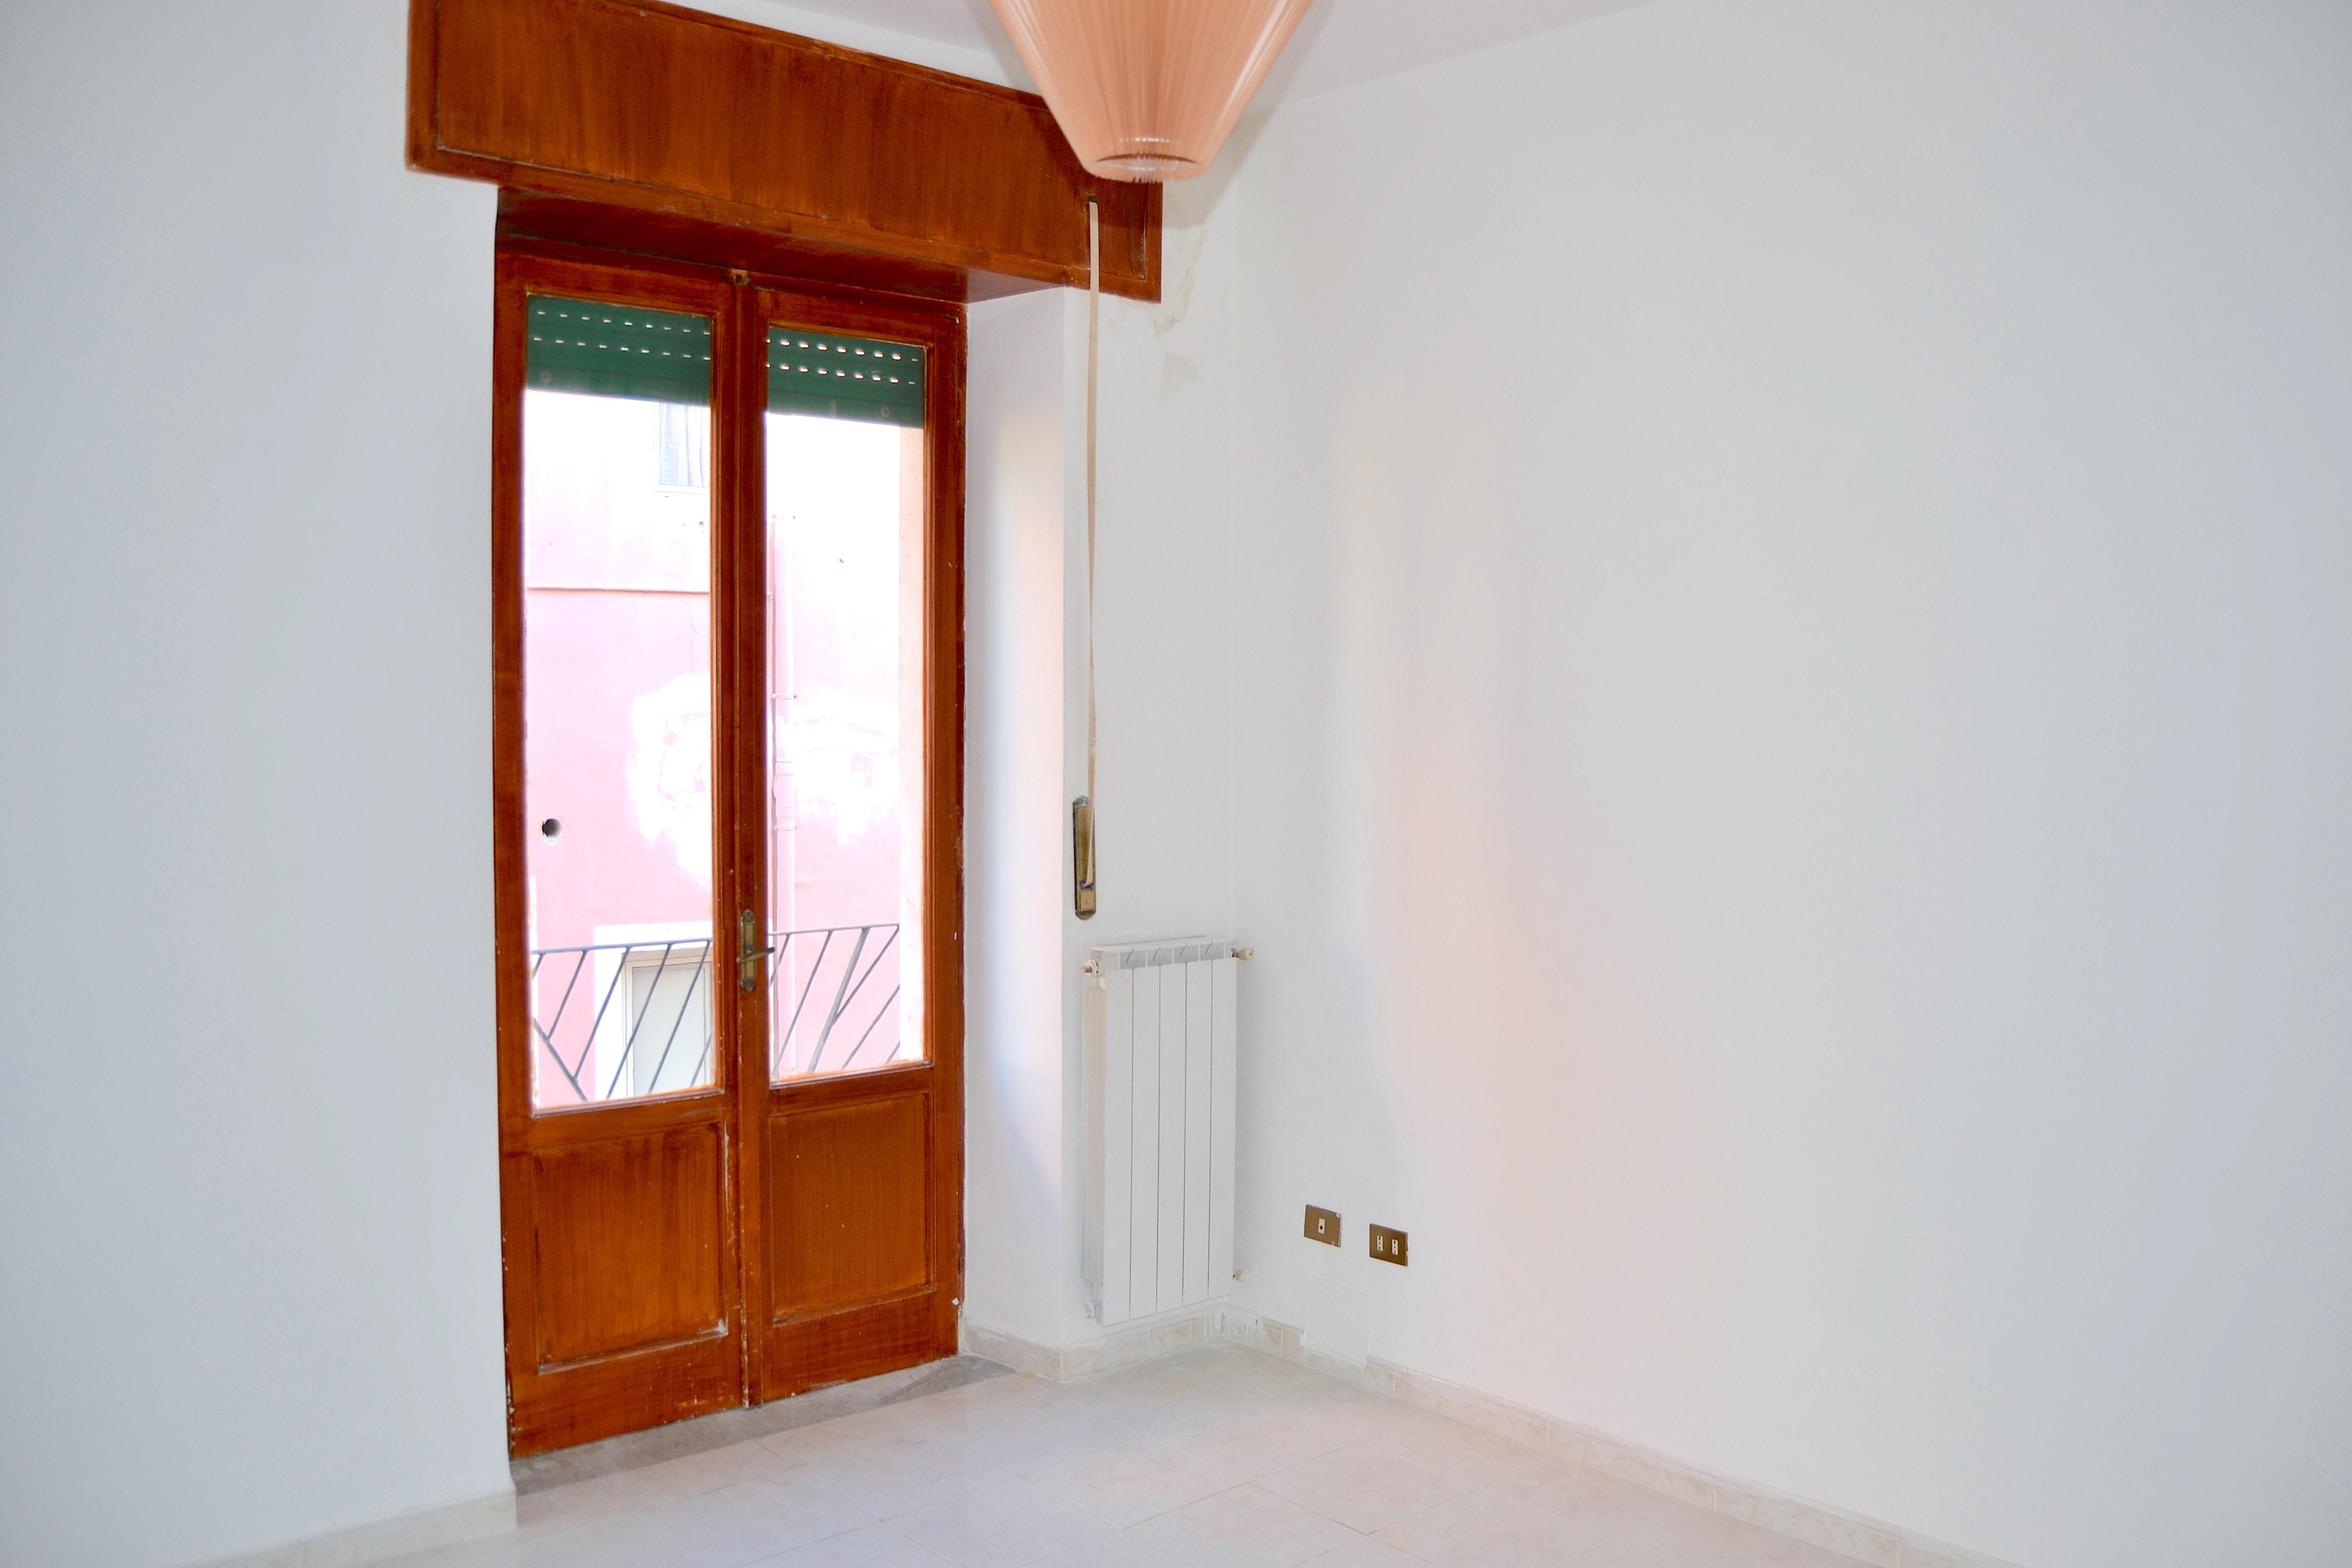 Gaeta Zona San Carlo. Appartamento in Vendita a Gaeta.